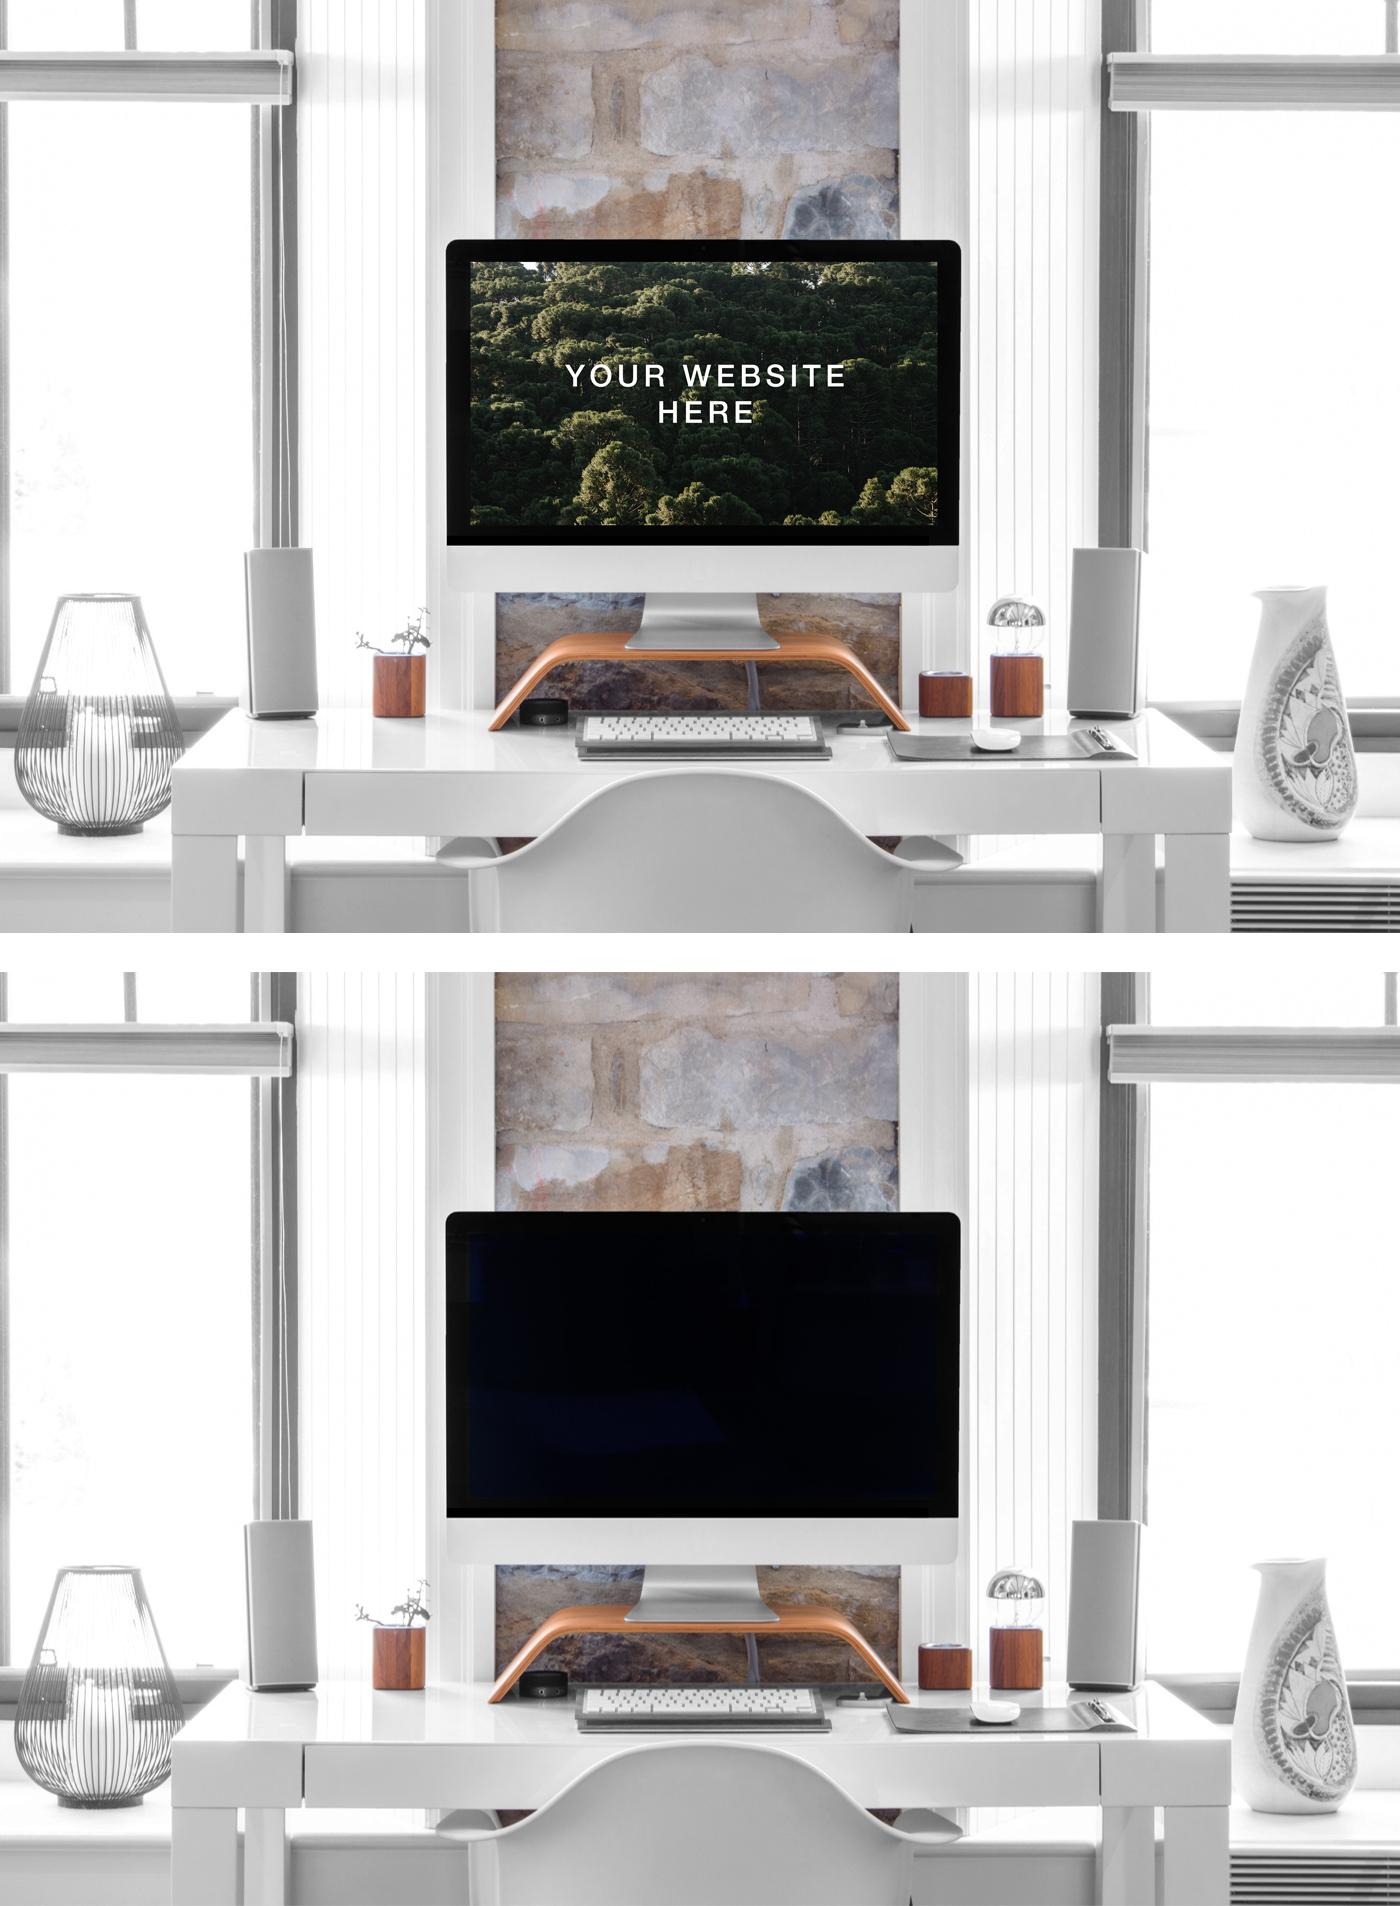 iMac 27' Mockup